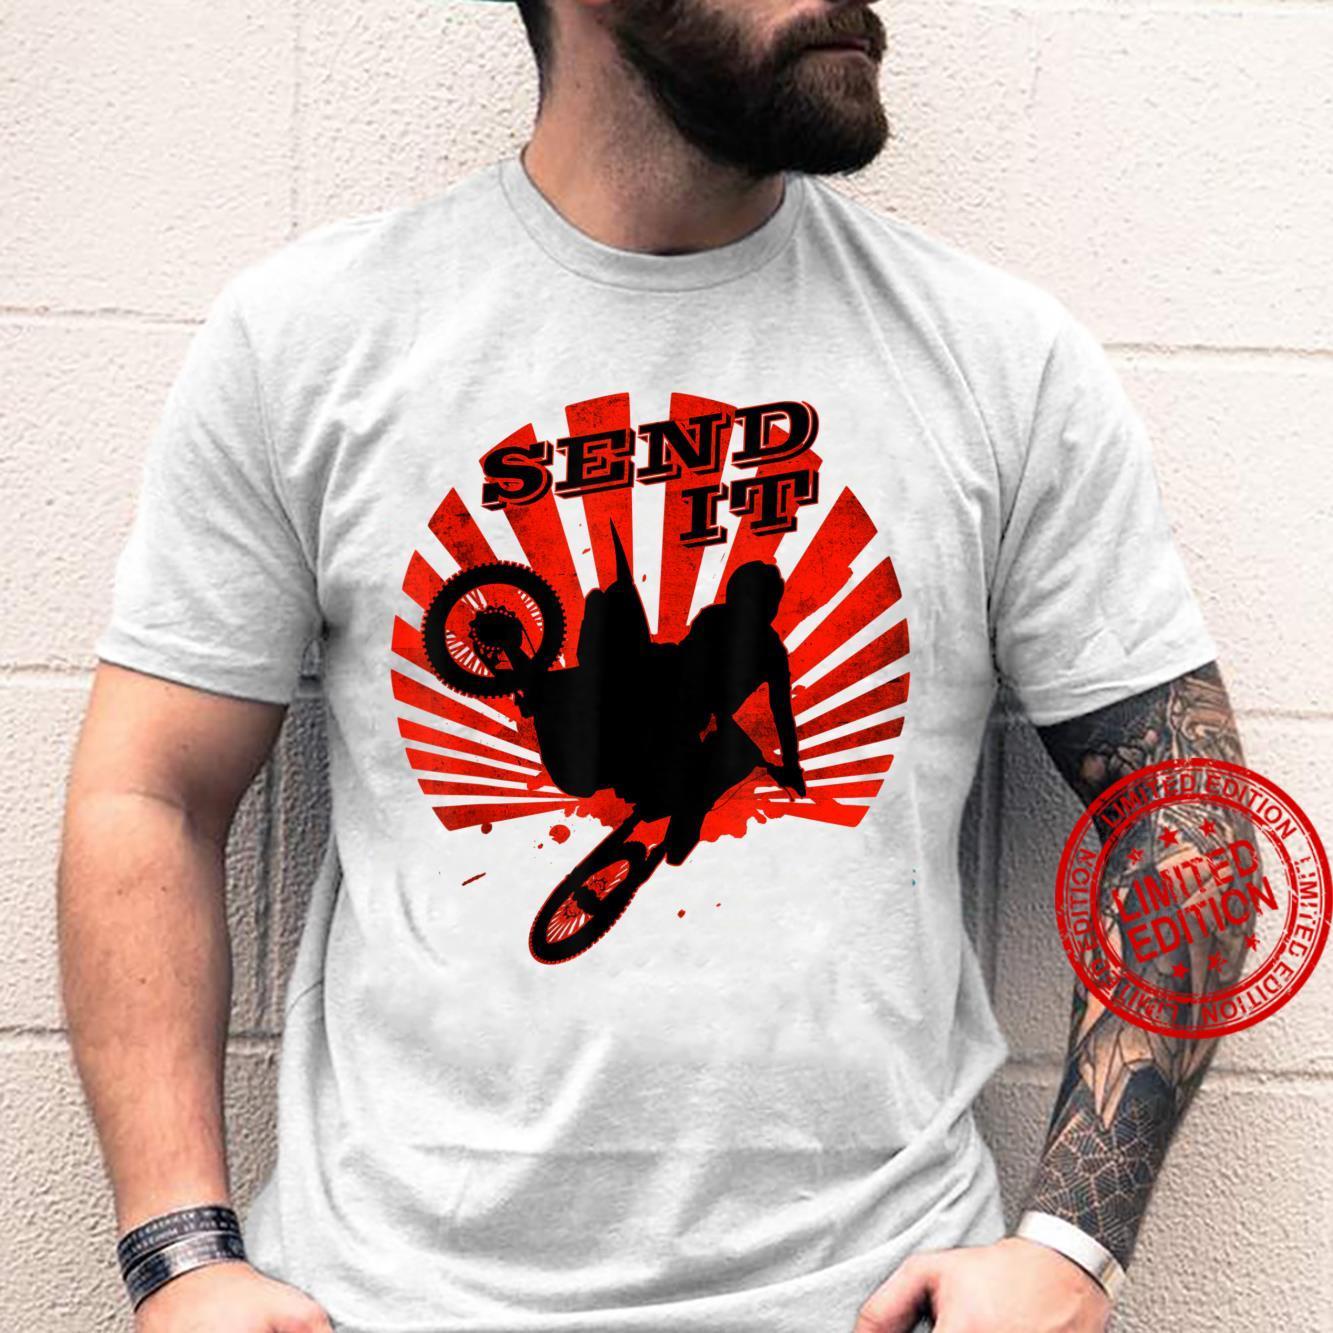 Just Send It Ride Dirt Bike Motorcycle Motocross Shirt